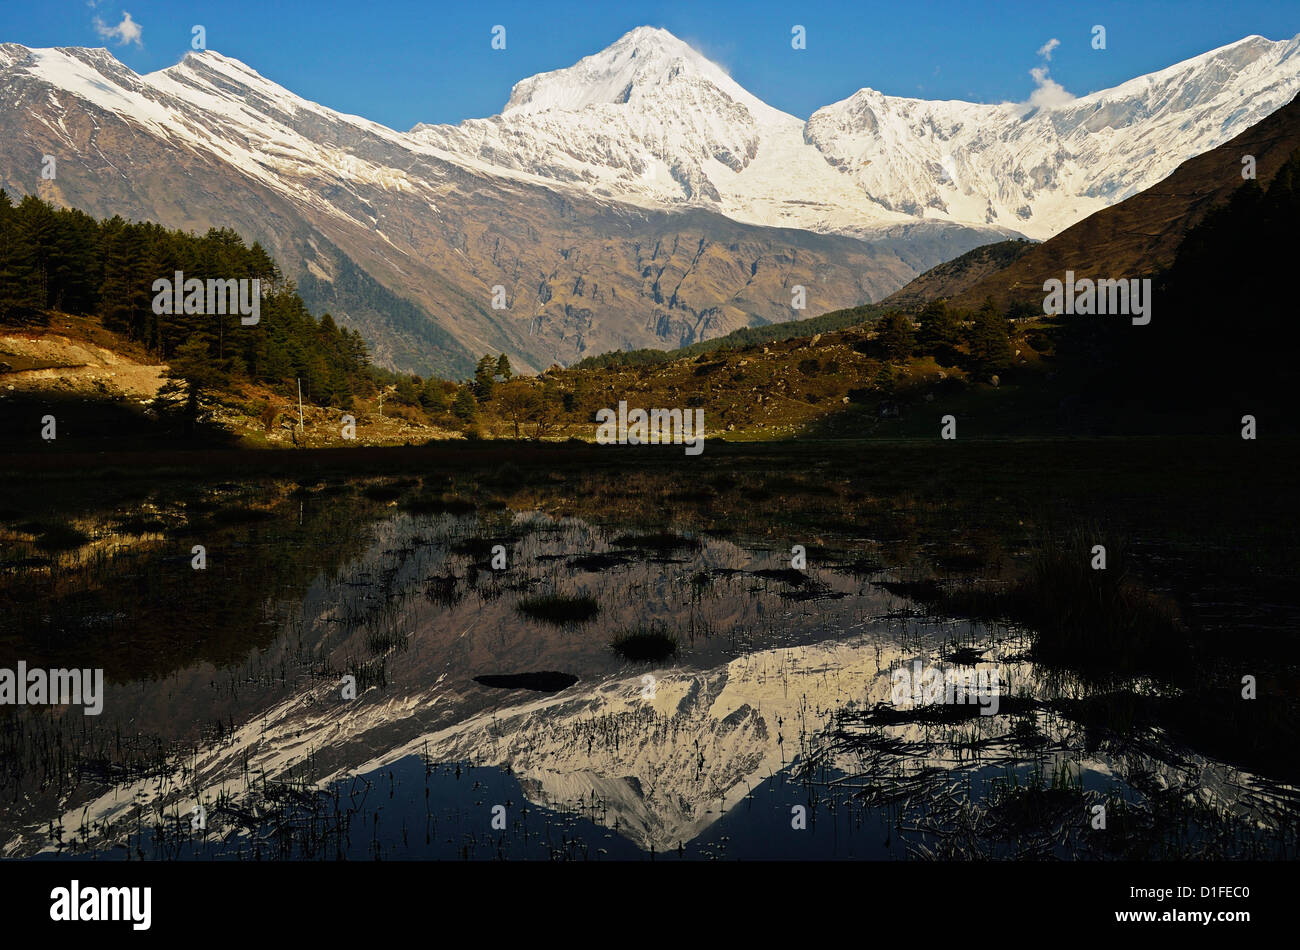 Dhaulagiri Himal visto da Titi, Annapurna Area di Conservazione, Dhawalagiri (Dhaulagiri), Regione Occidentale (Pashchimanchal), Immagini Stock